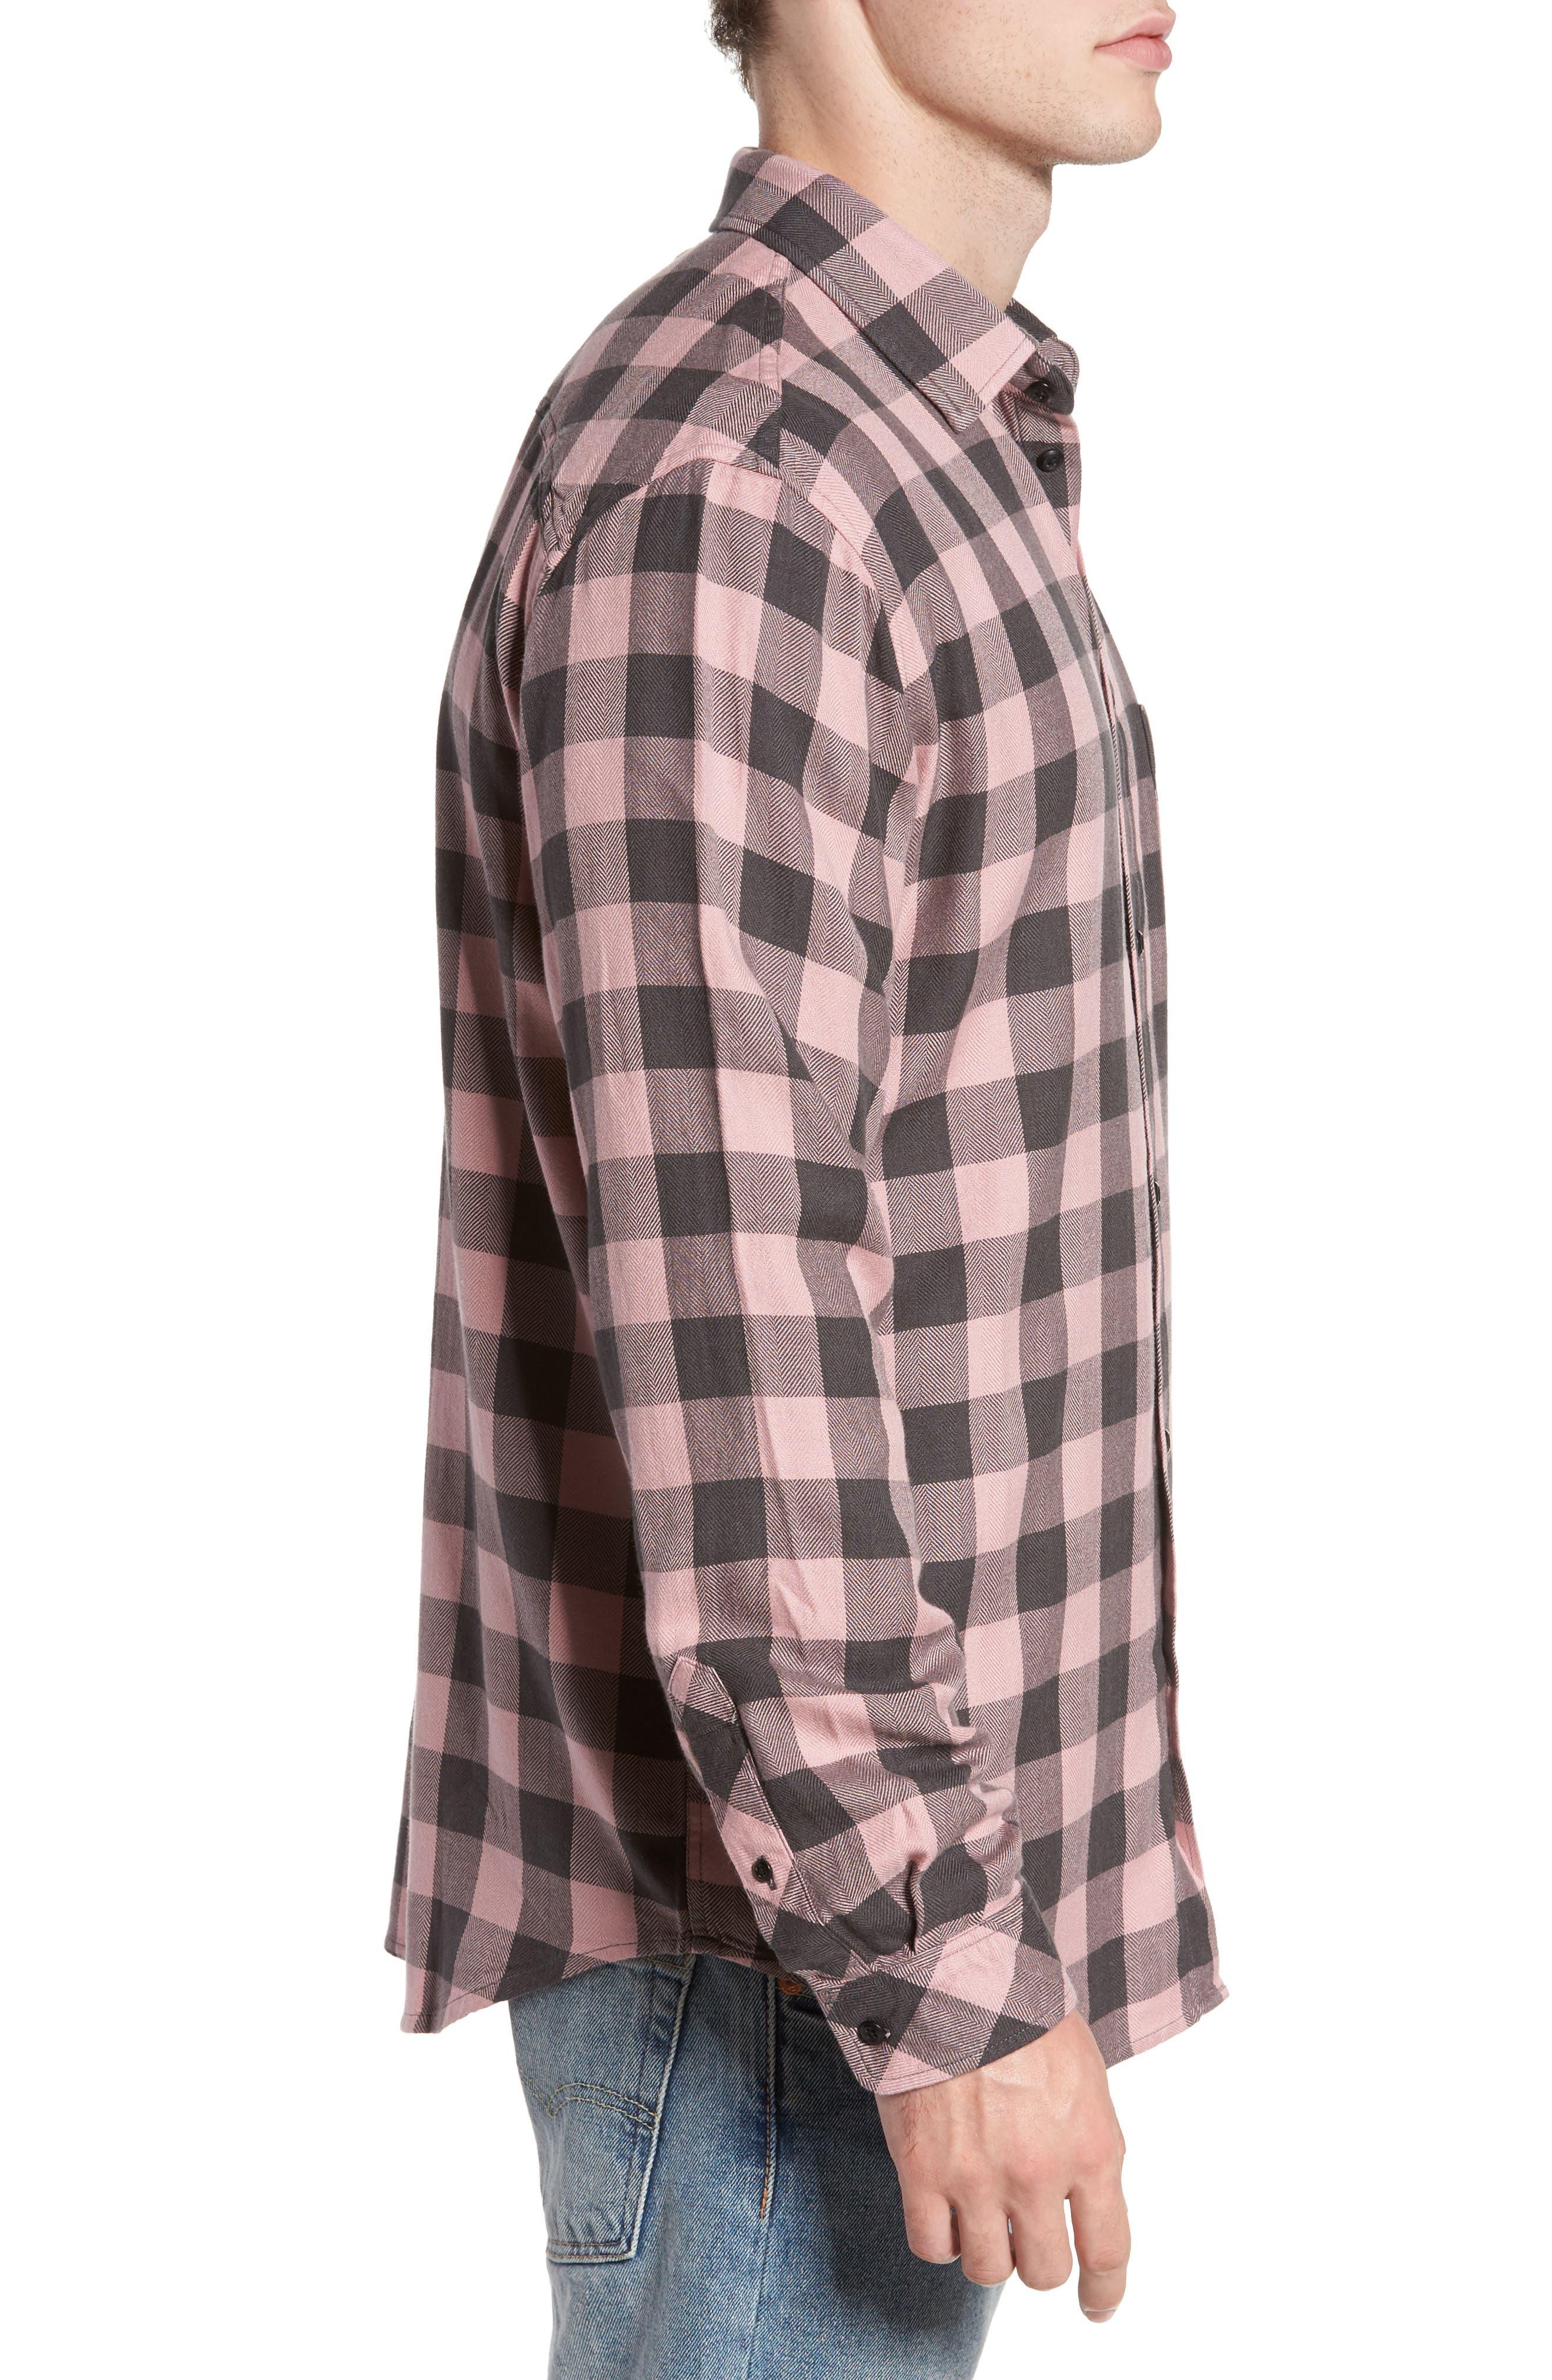 Lennox Sport Shirt,                             Alternate thumbnail 3, color,                             Pale Pink/ Charcoal